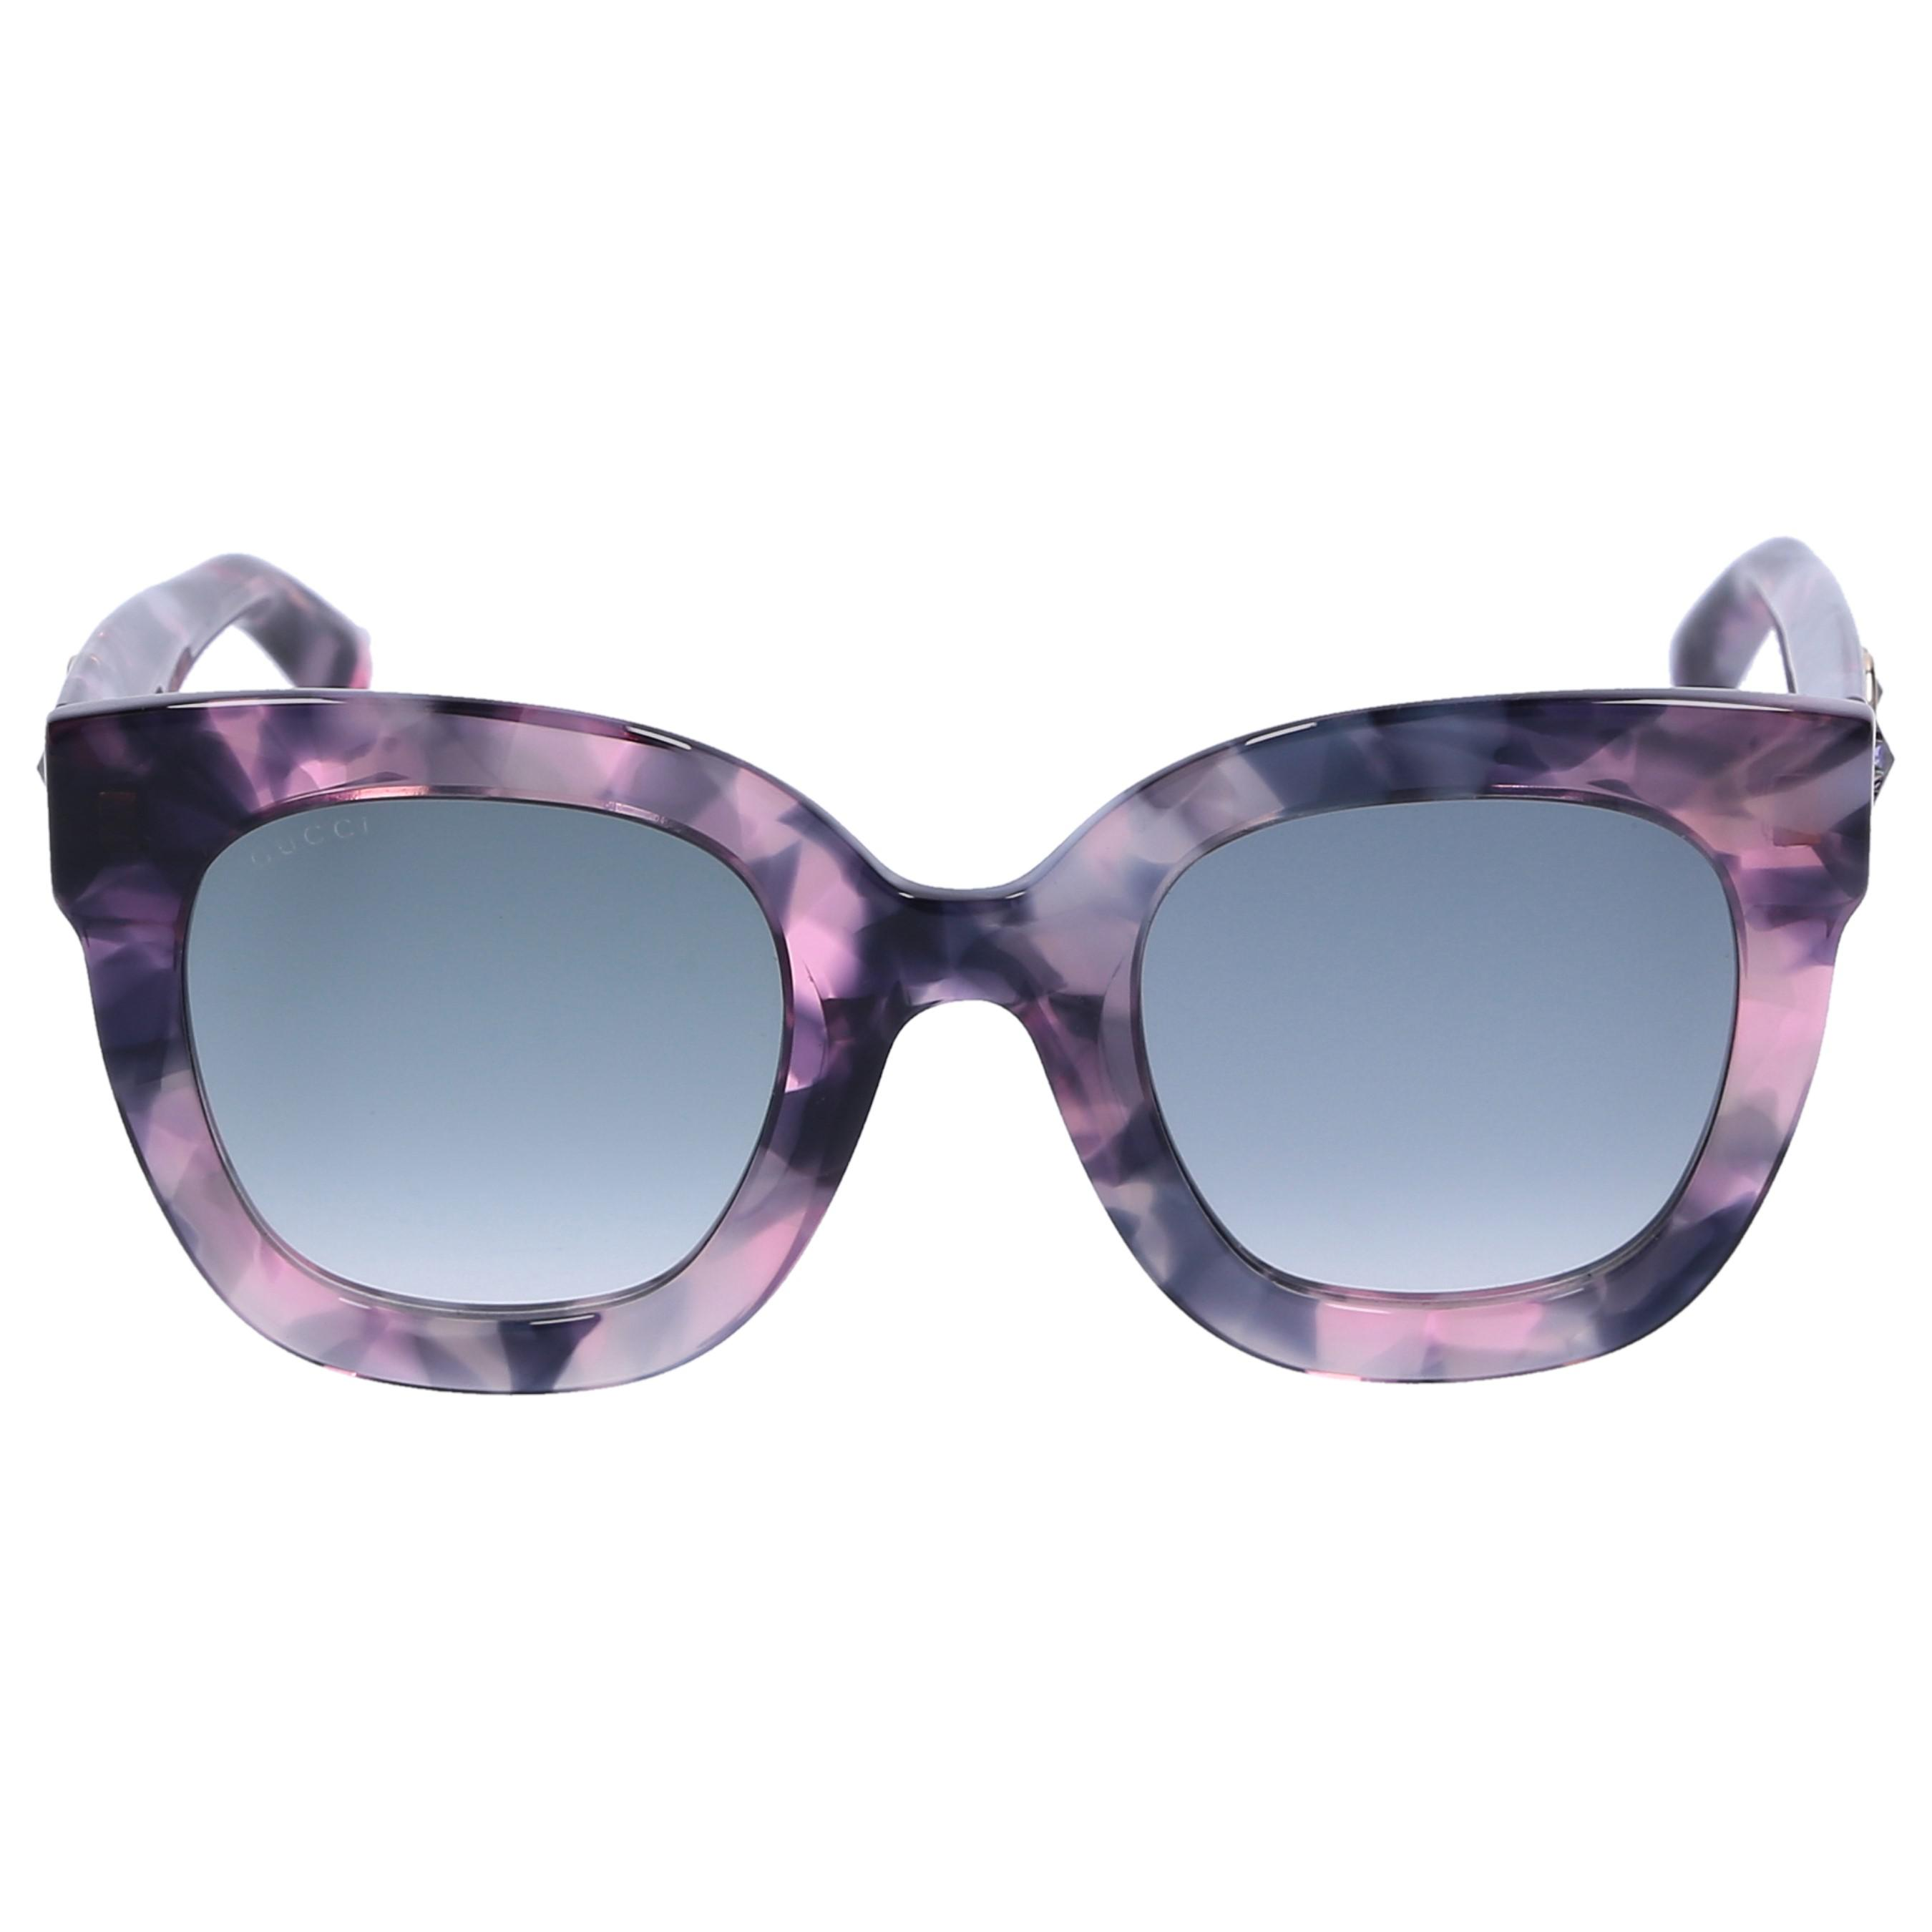 5bdc66ab6f6 Lyst - Gucci Women Sunglasses Square 208s Acetate Tortoiseshell Grey ...